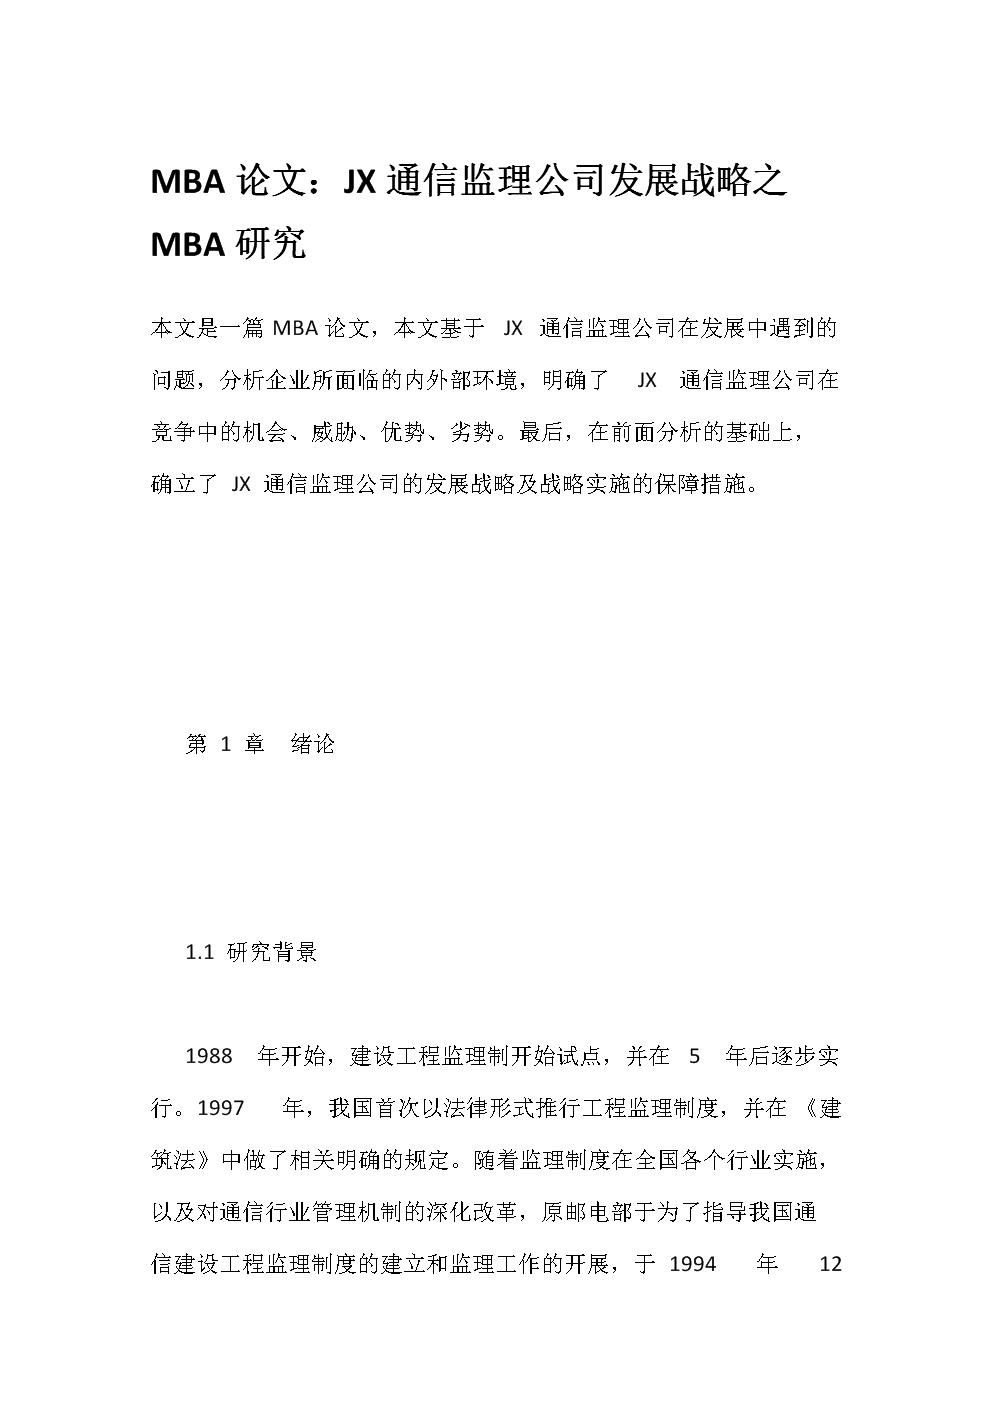 MBA论文:JX通信监理公司发展战略之MBA研究.docx